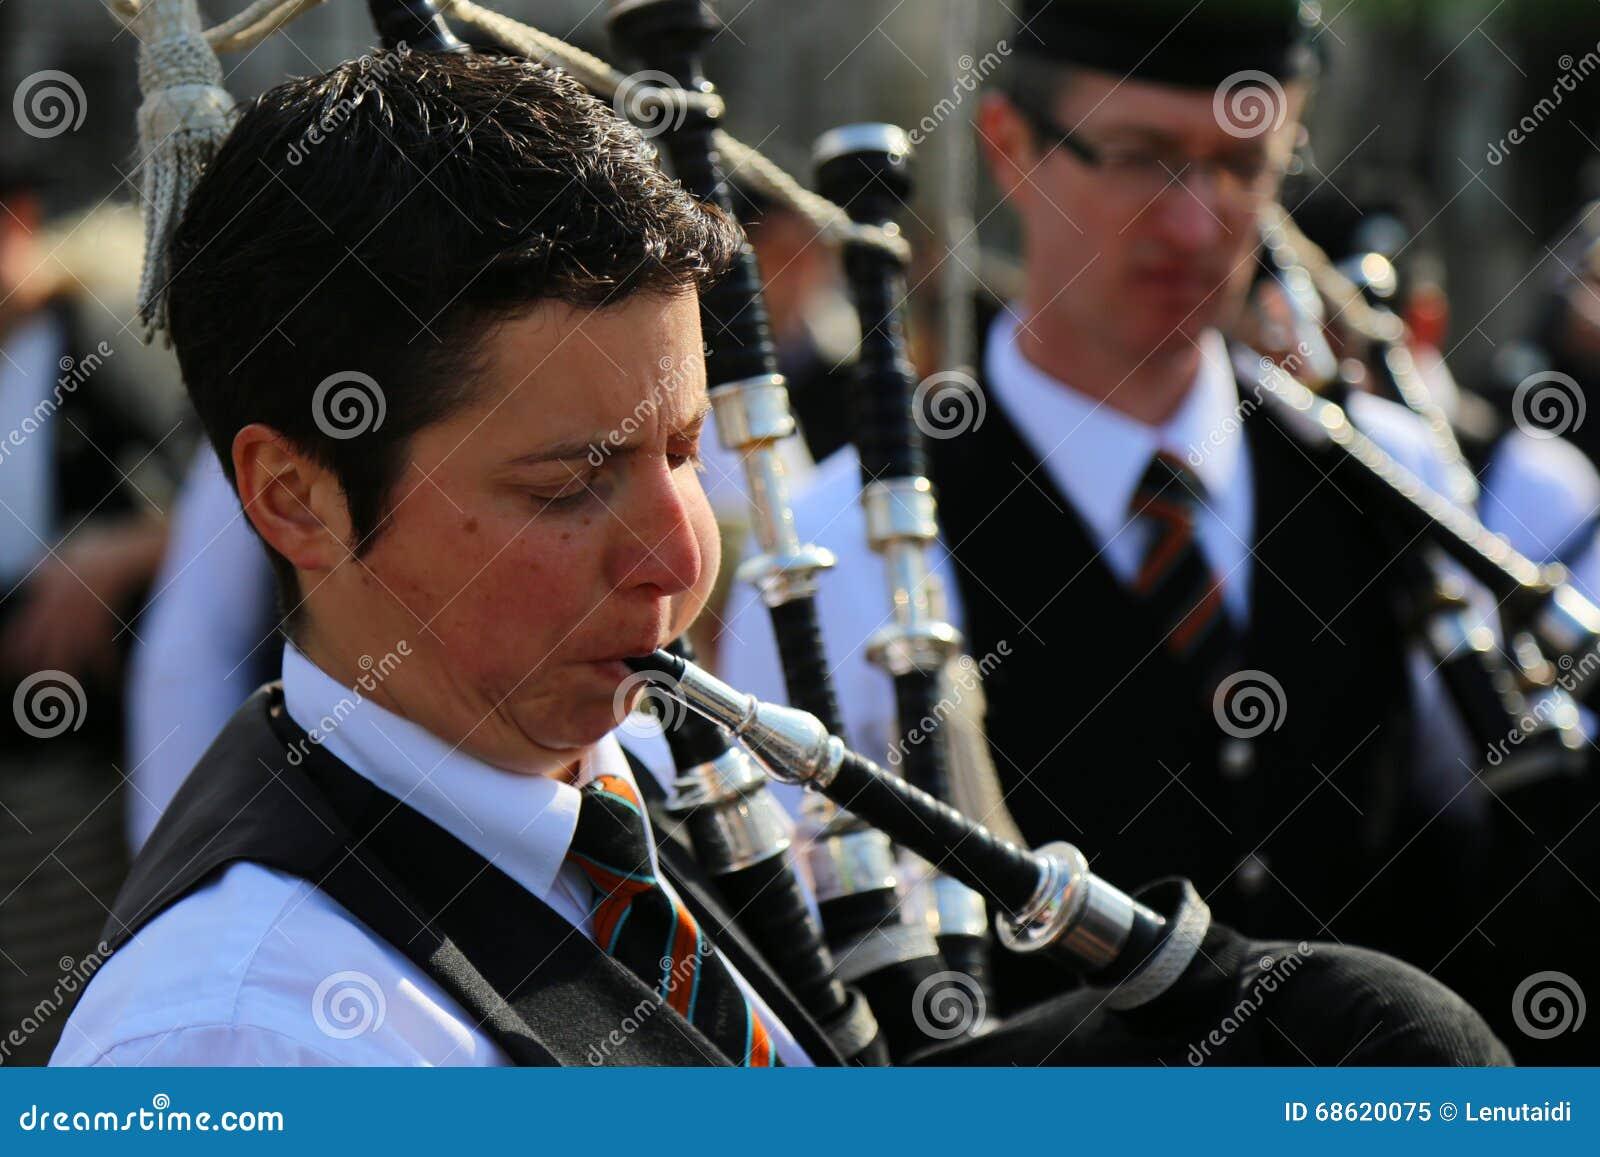 St Patrick parade - bagpiper